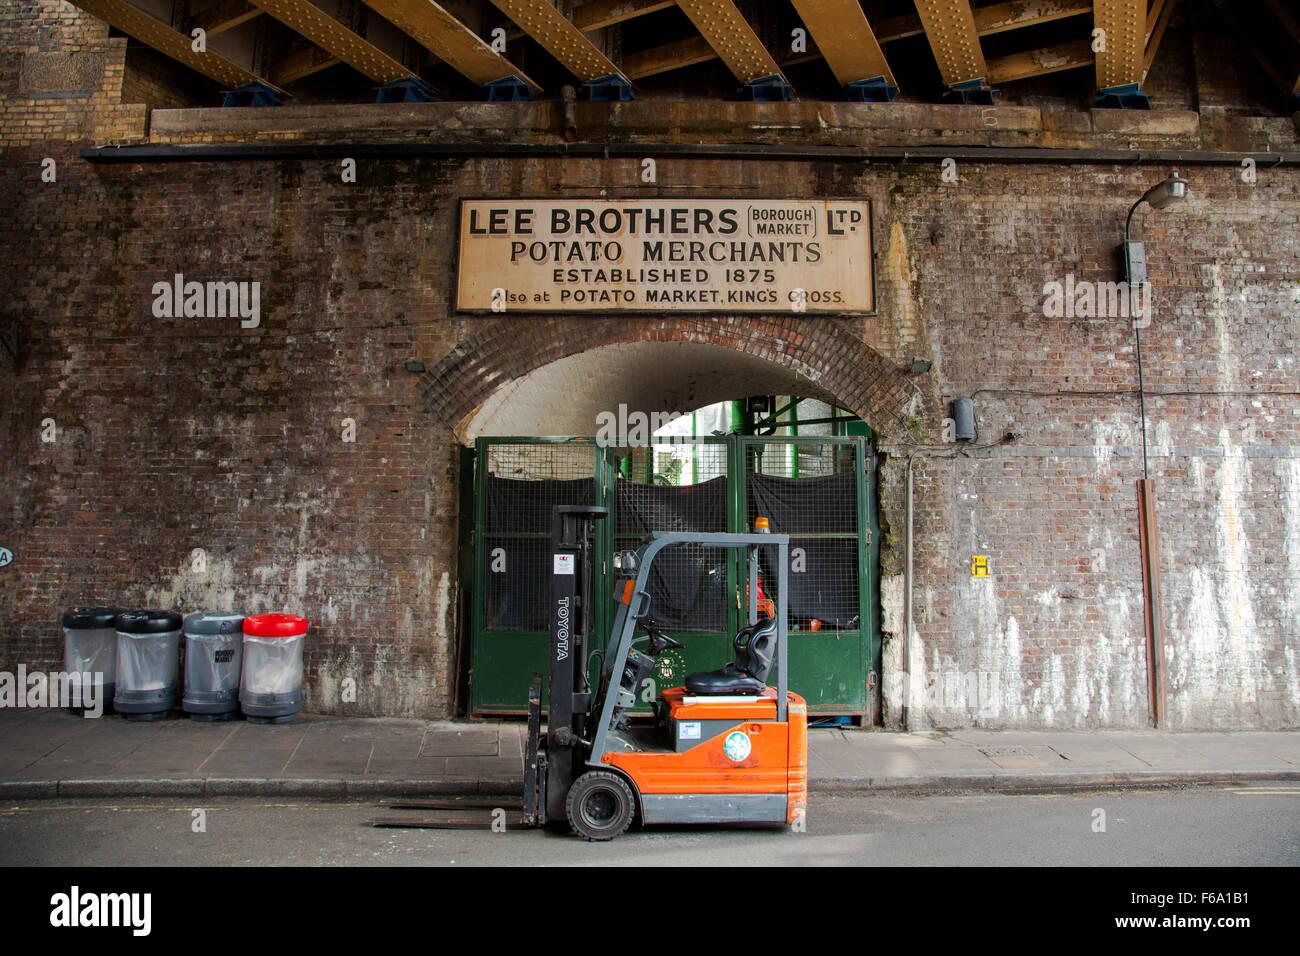 Lee Brothers Potato Merchants Borough Market London England U K